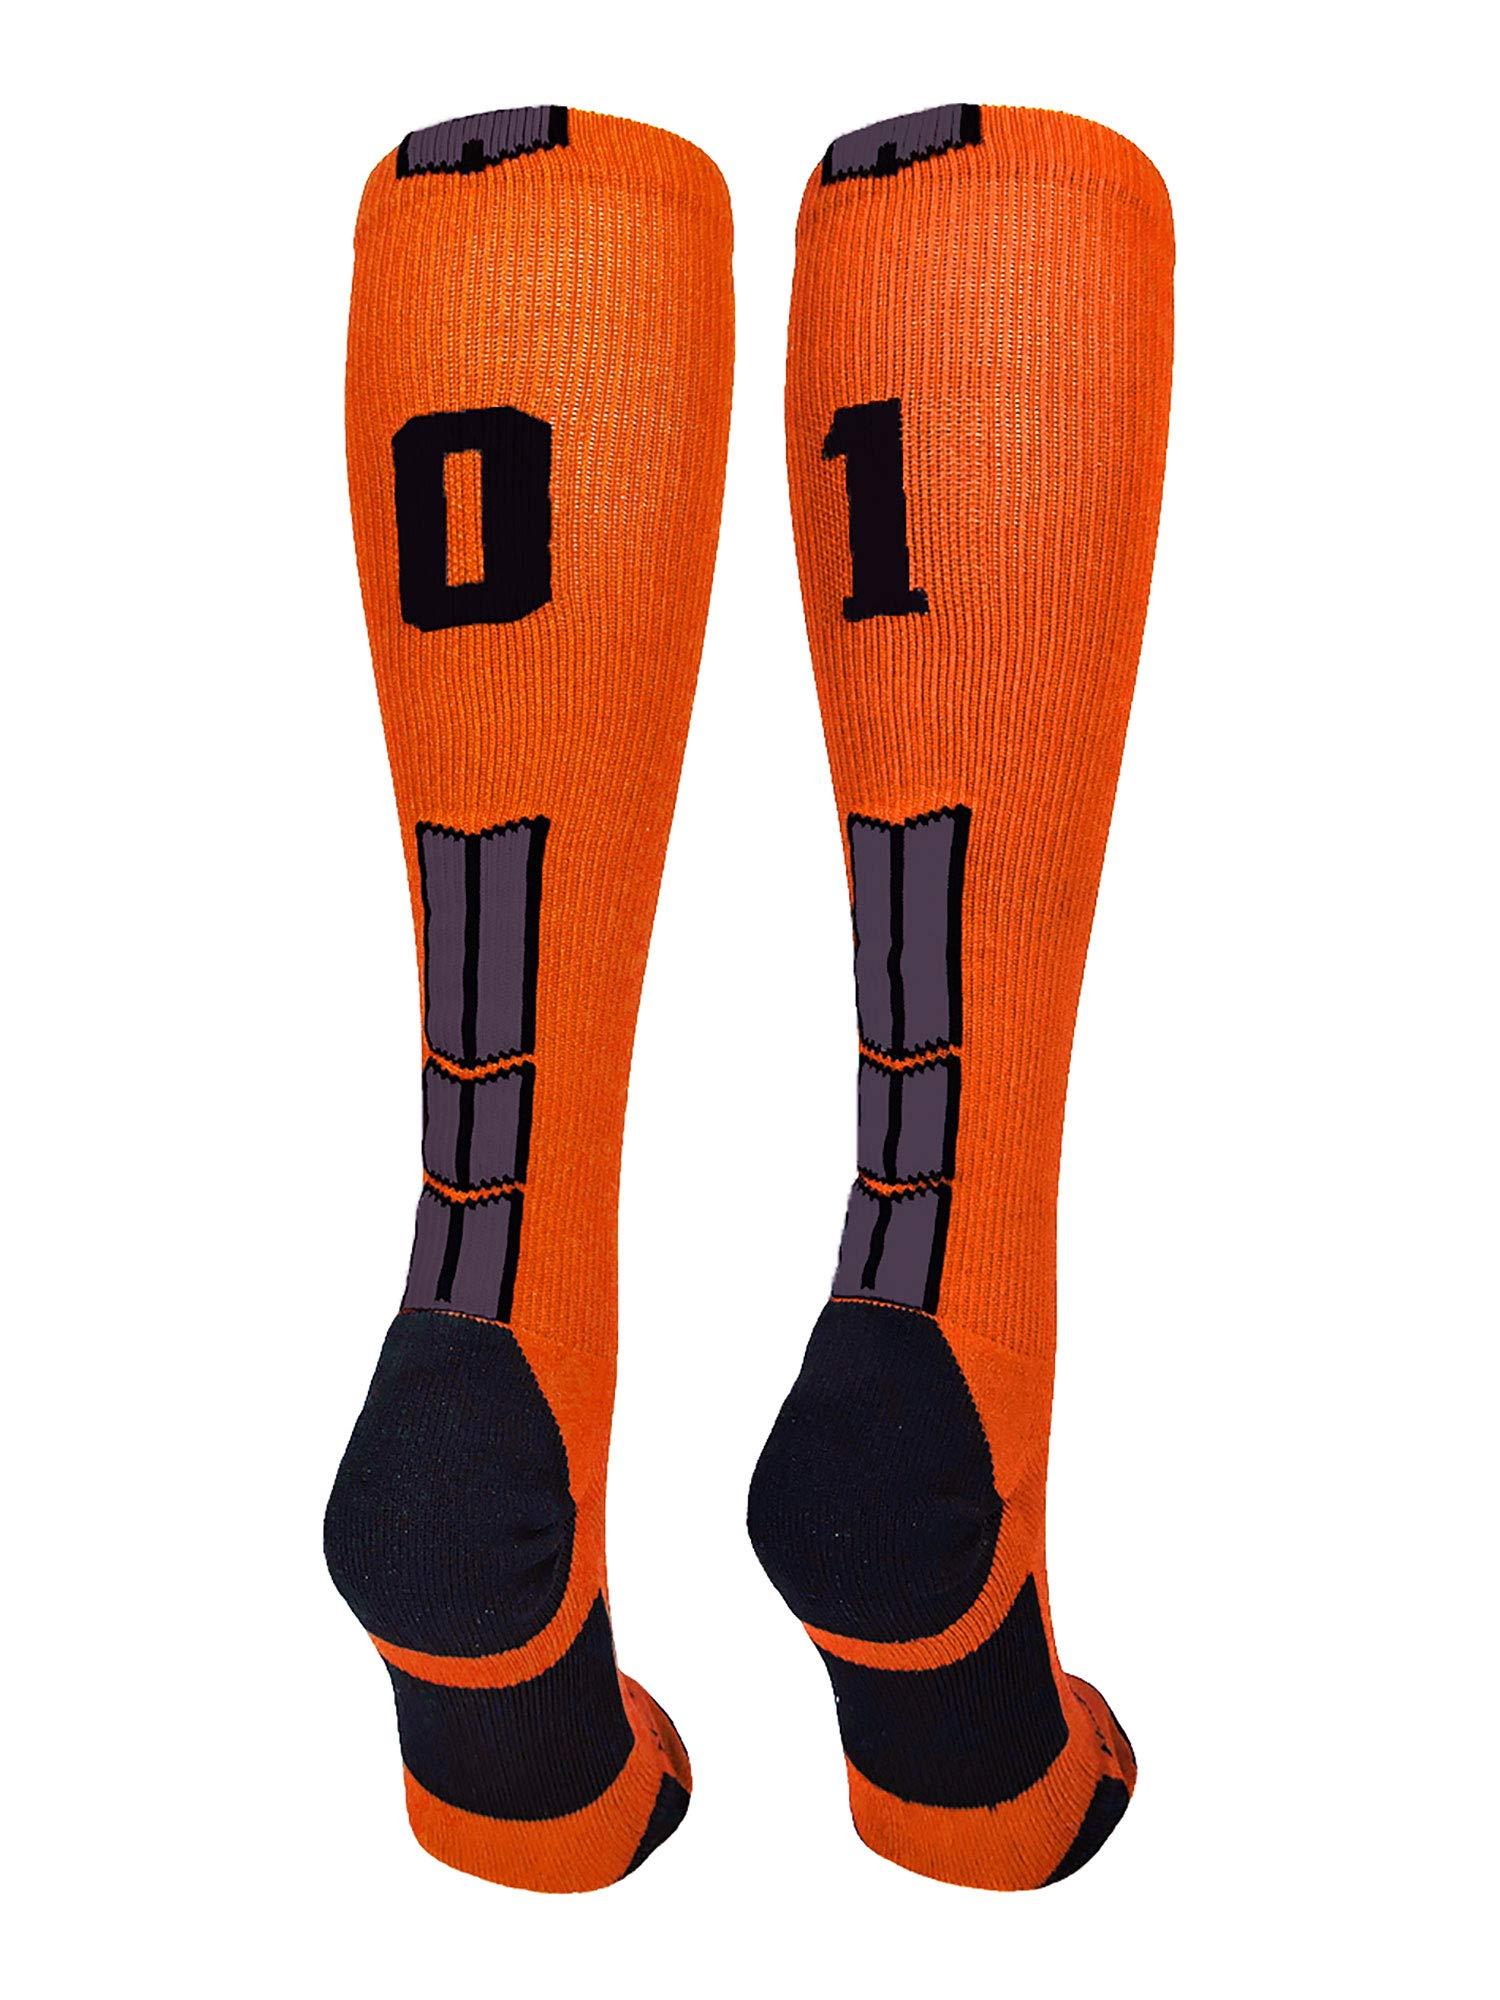 MadSportsStuff Orange/Black Player Id Over the Calf Number Socks (#01, Small)